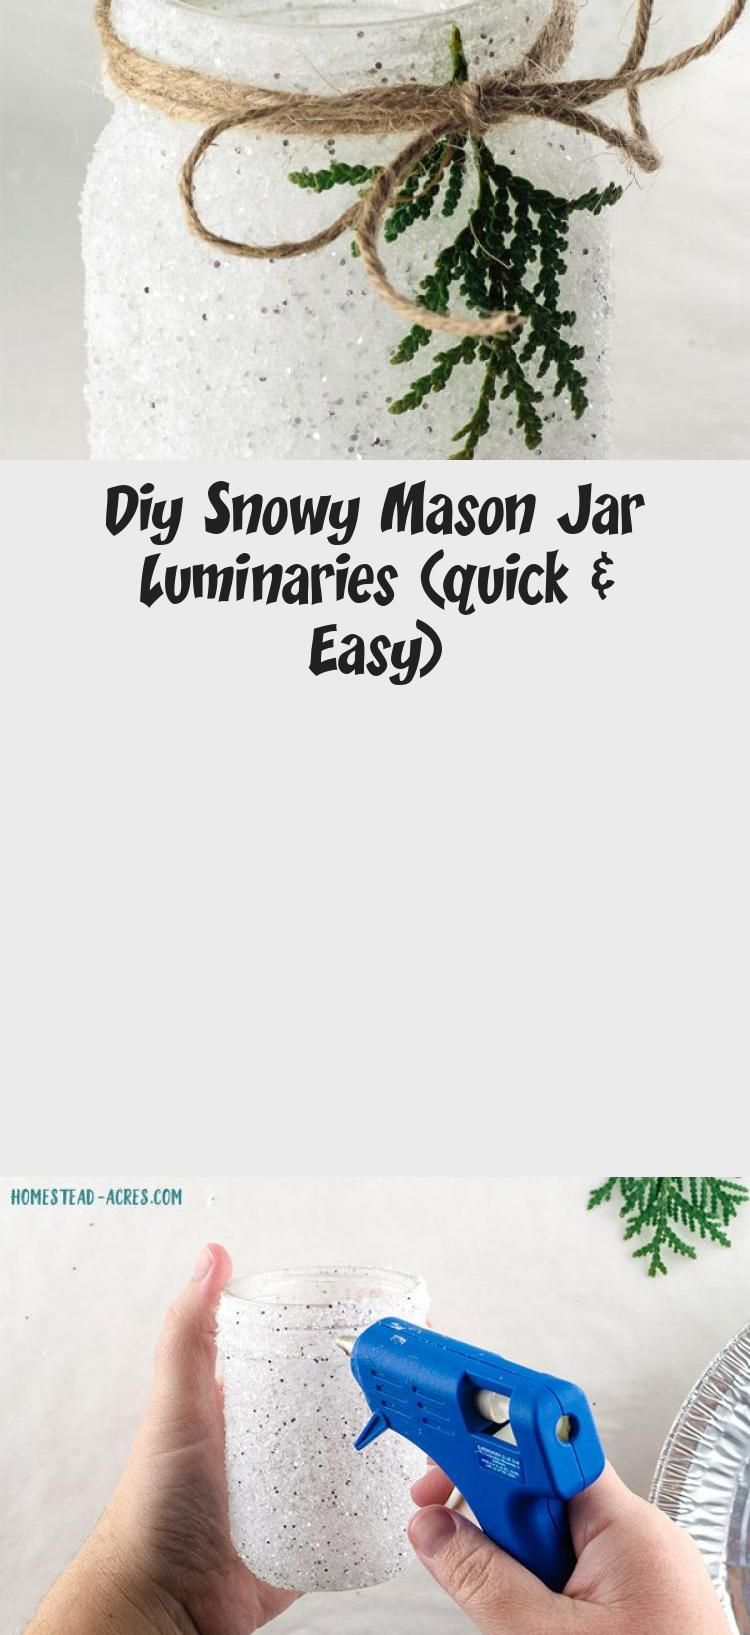 Diy Snowy Mason Jar Luminaries (quick & Easy) | Mason jar ...